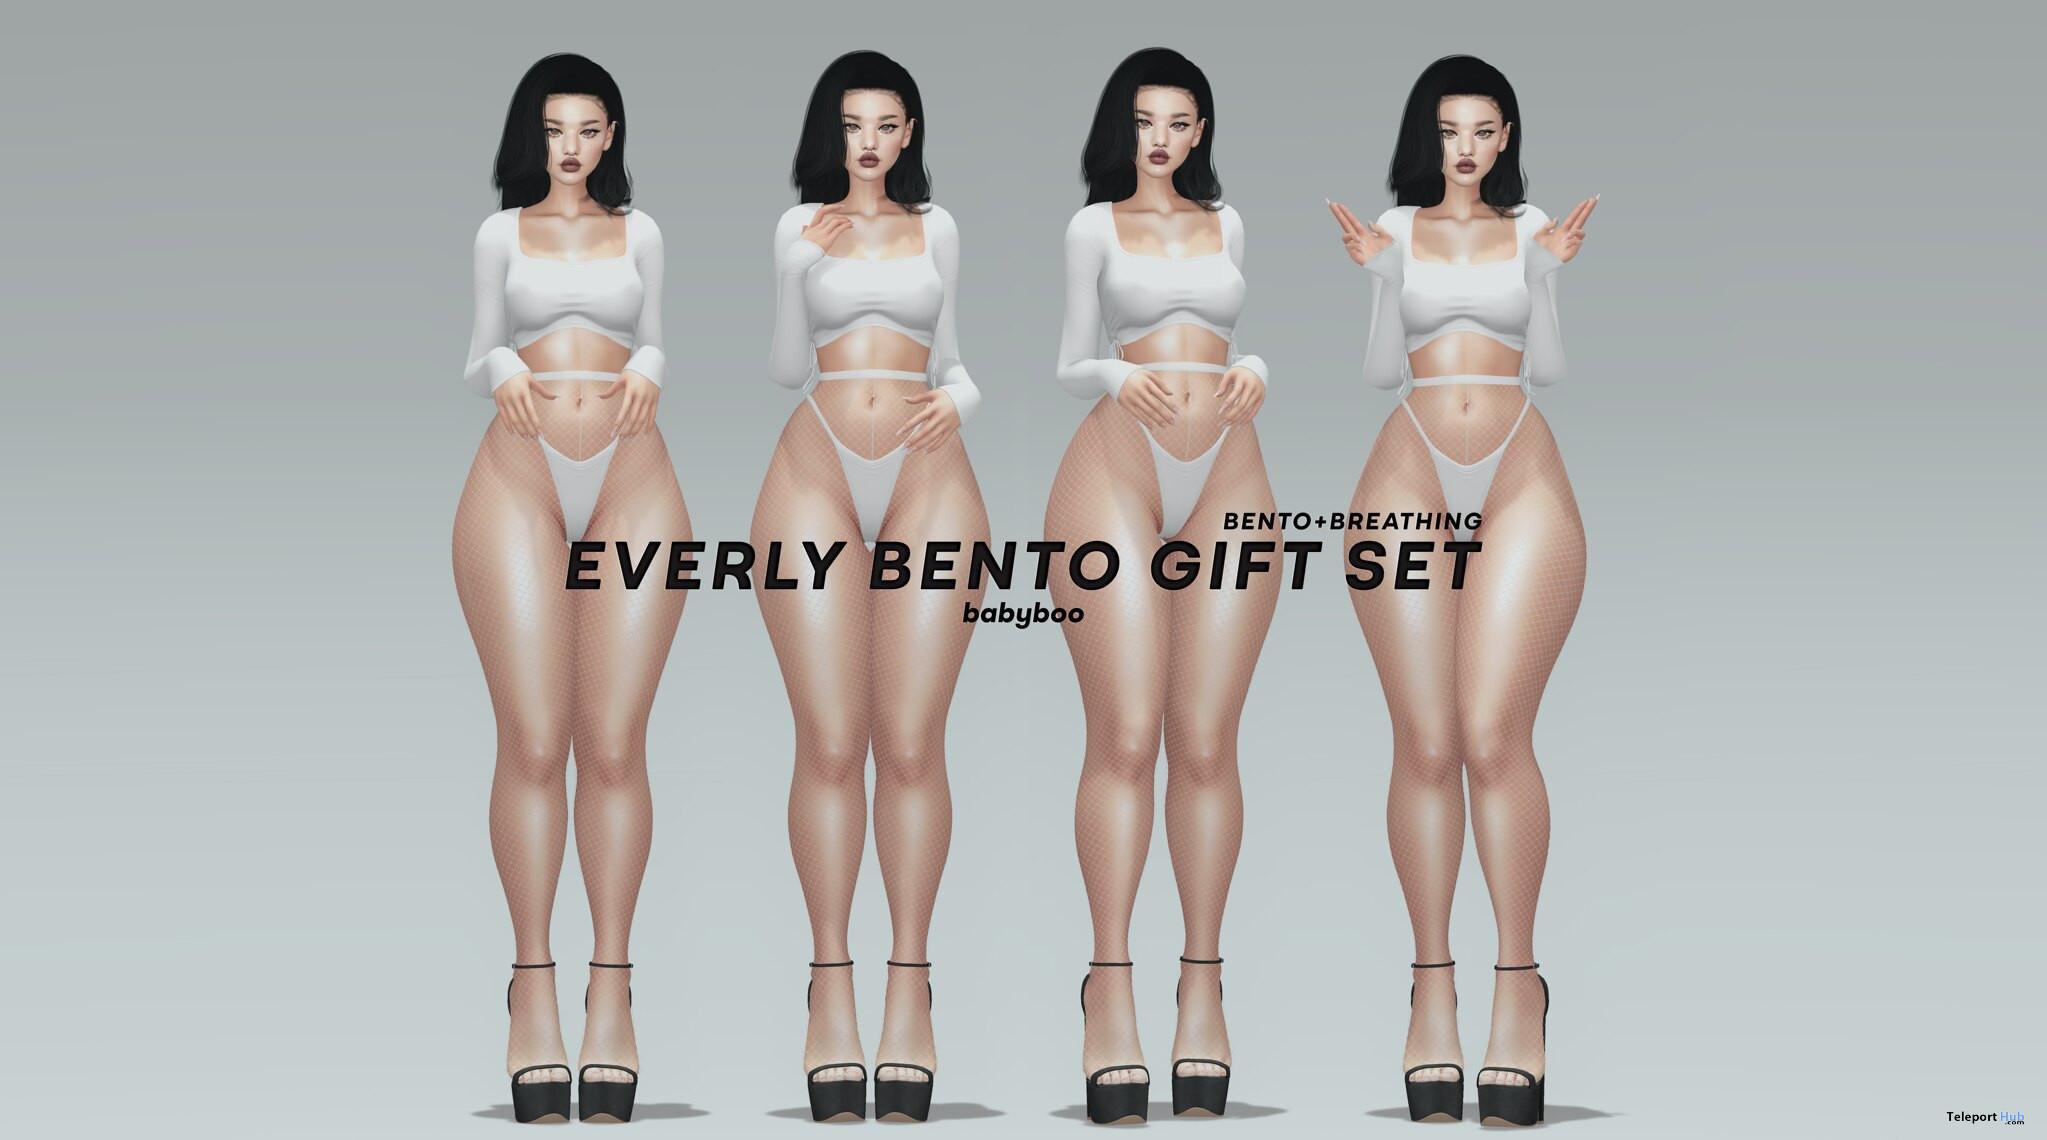 Everly Bento Set July 2021 Group Gift by Babyboo - Teleport Hub - teleporthub.com